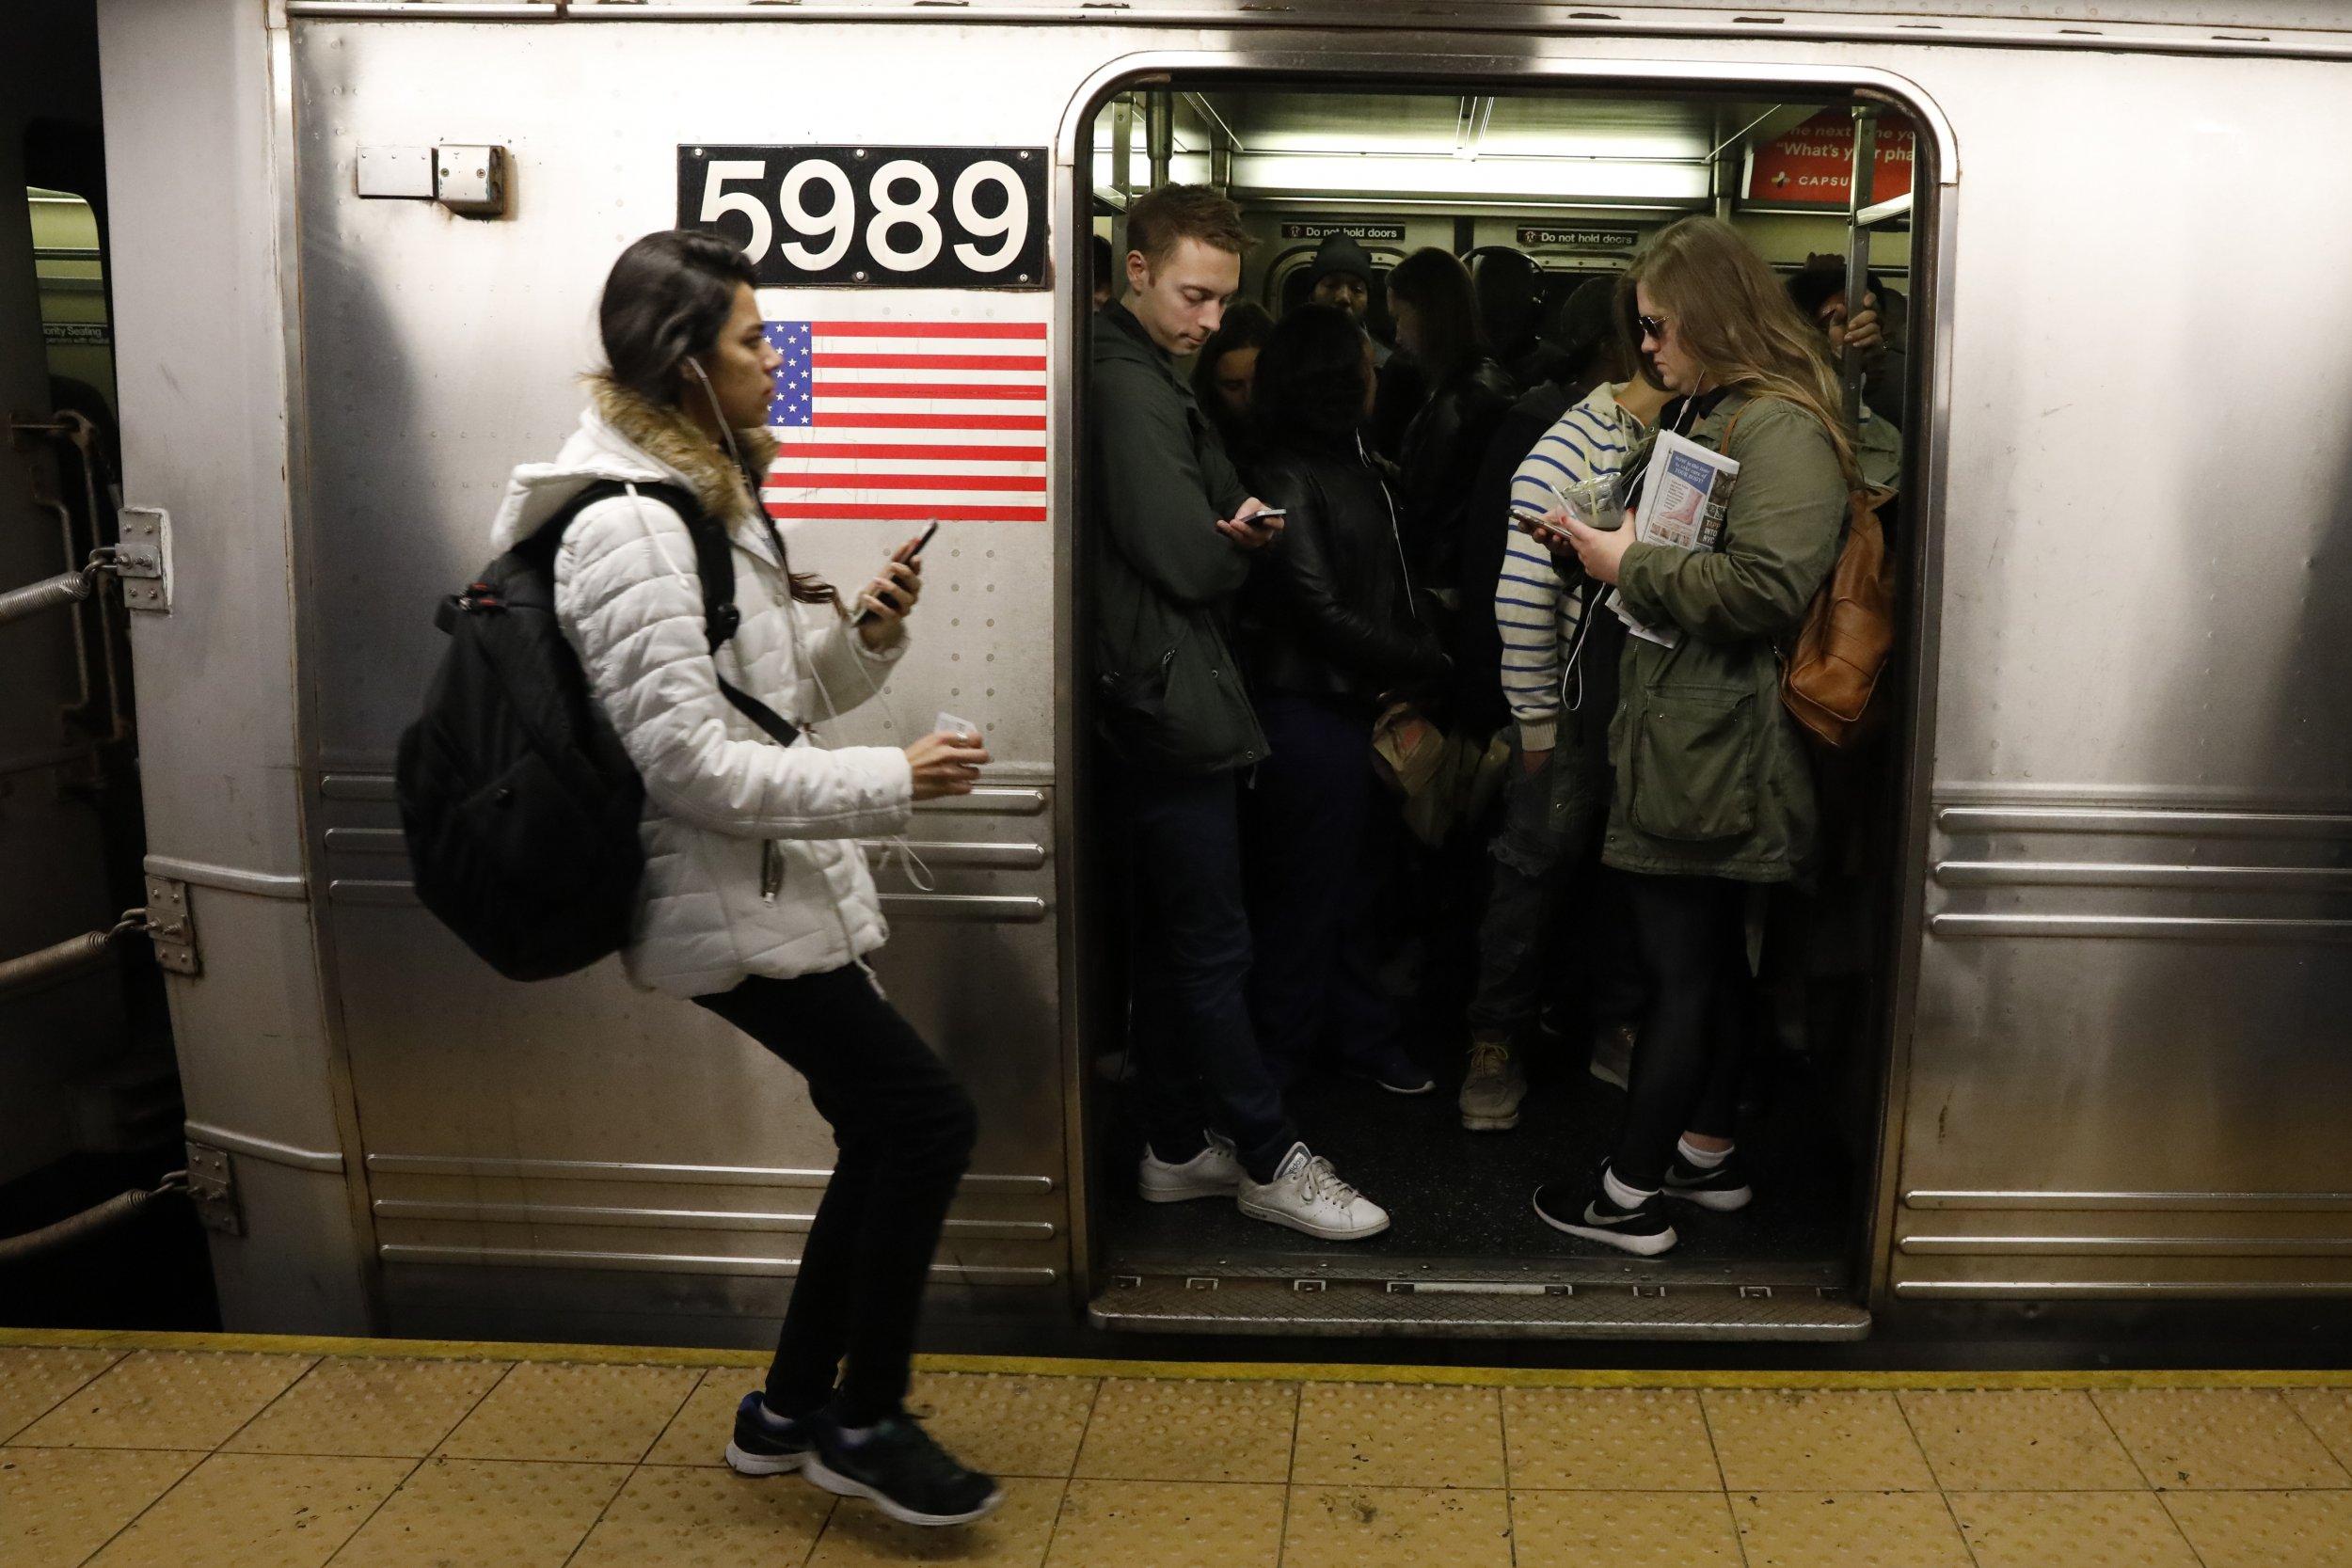 6-29-17 Subway